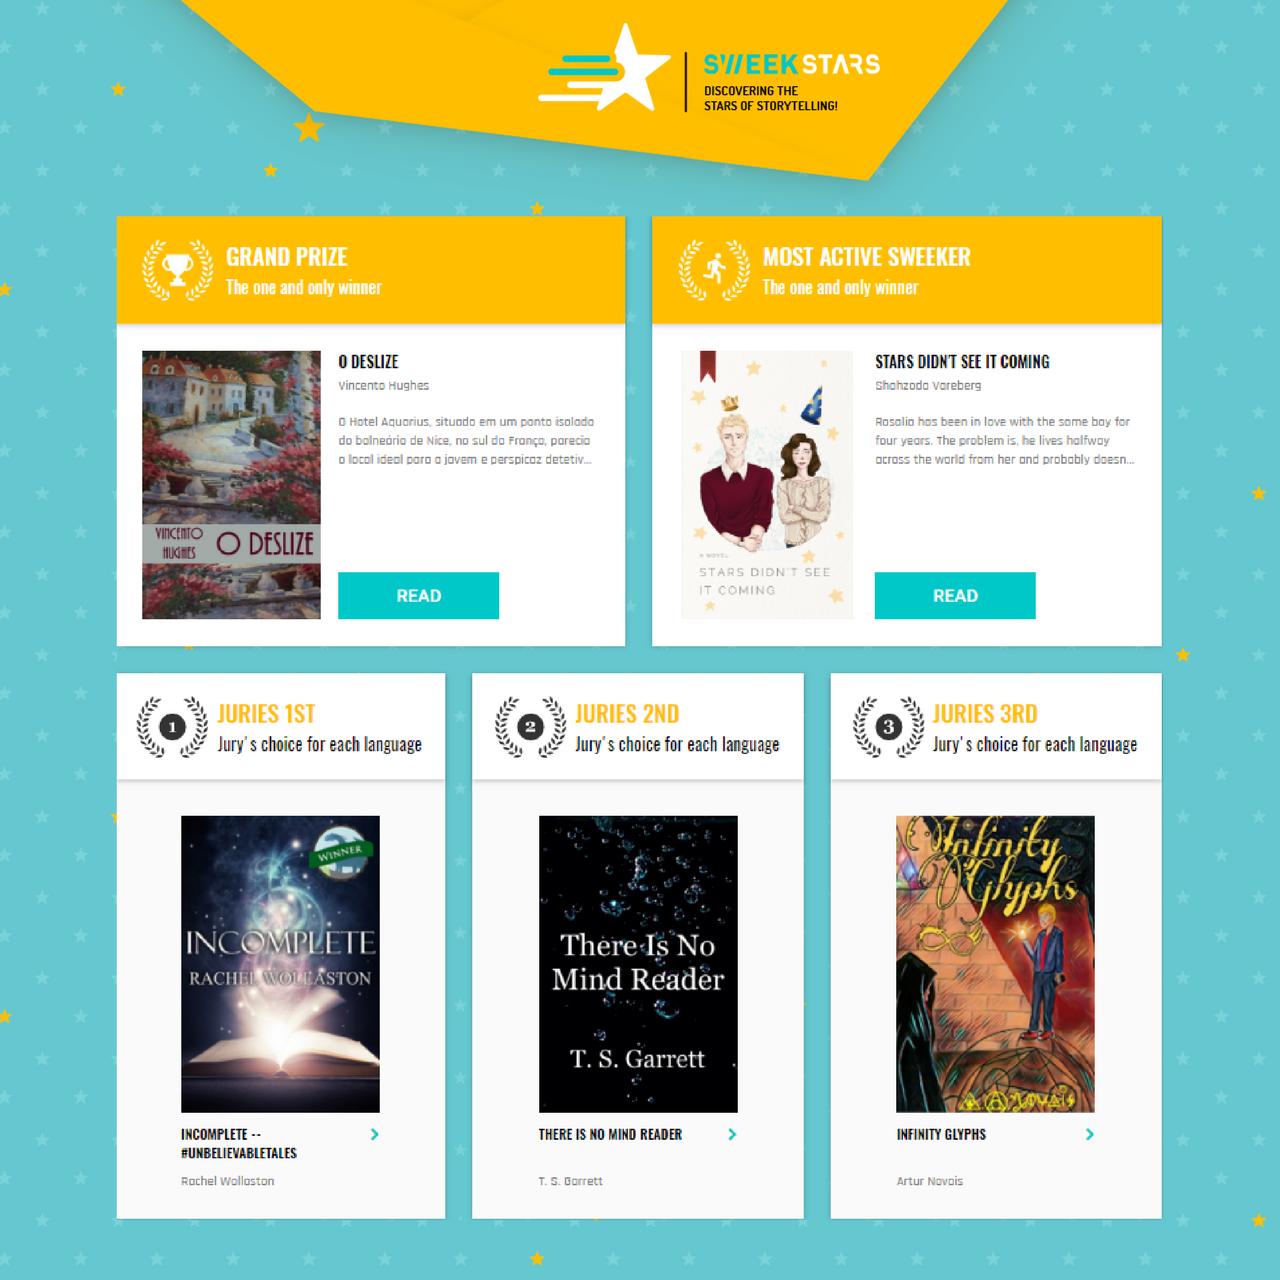 The winners and finalists of the SweekStars international writing